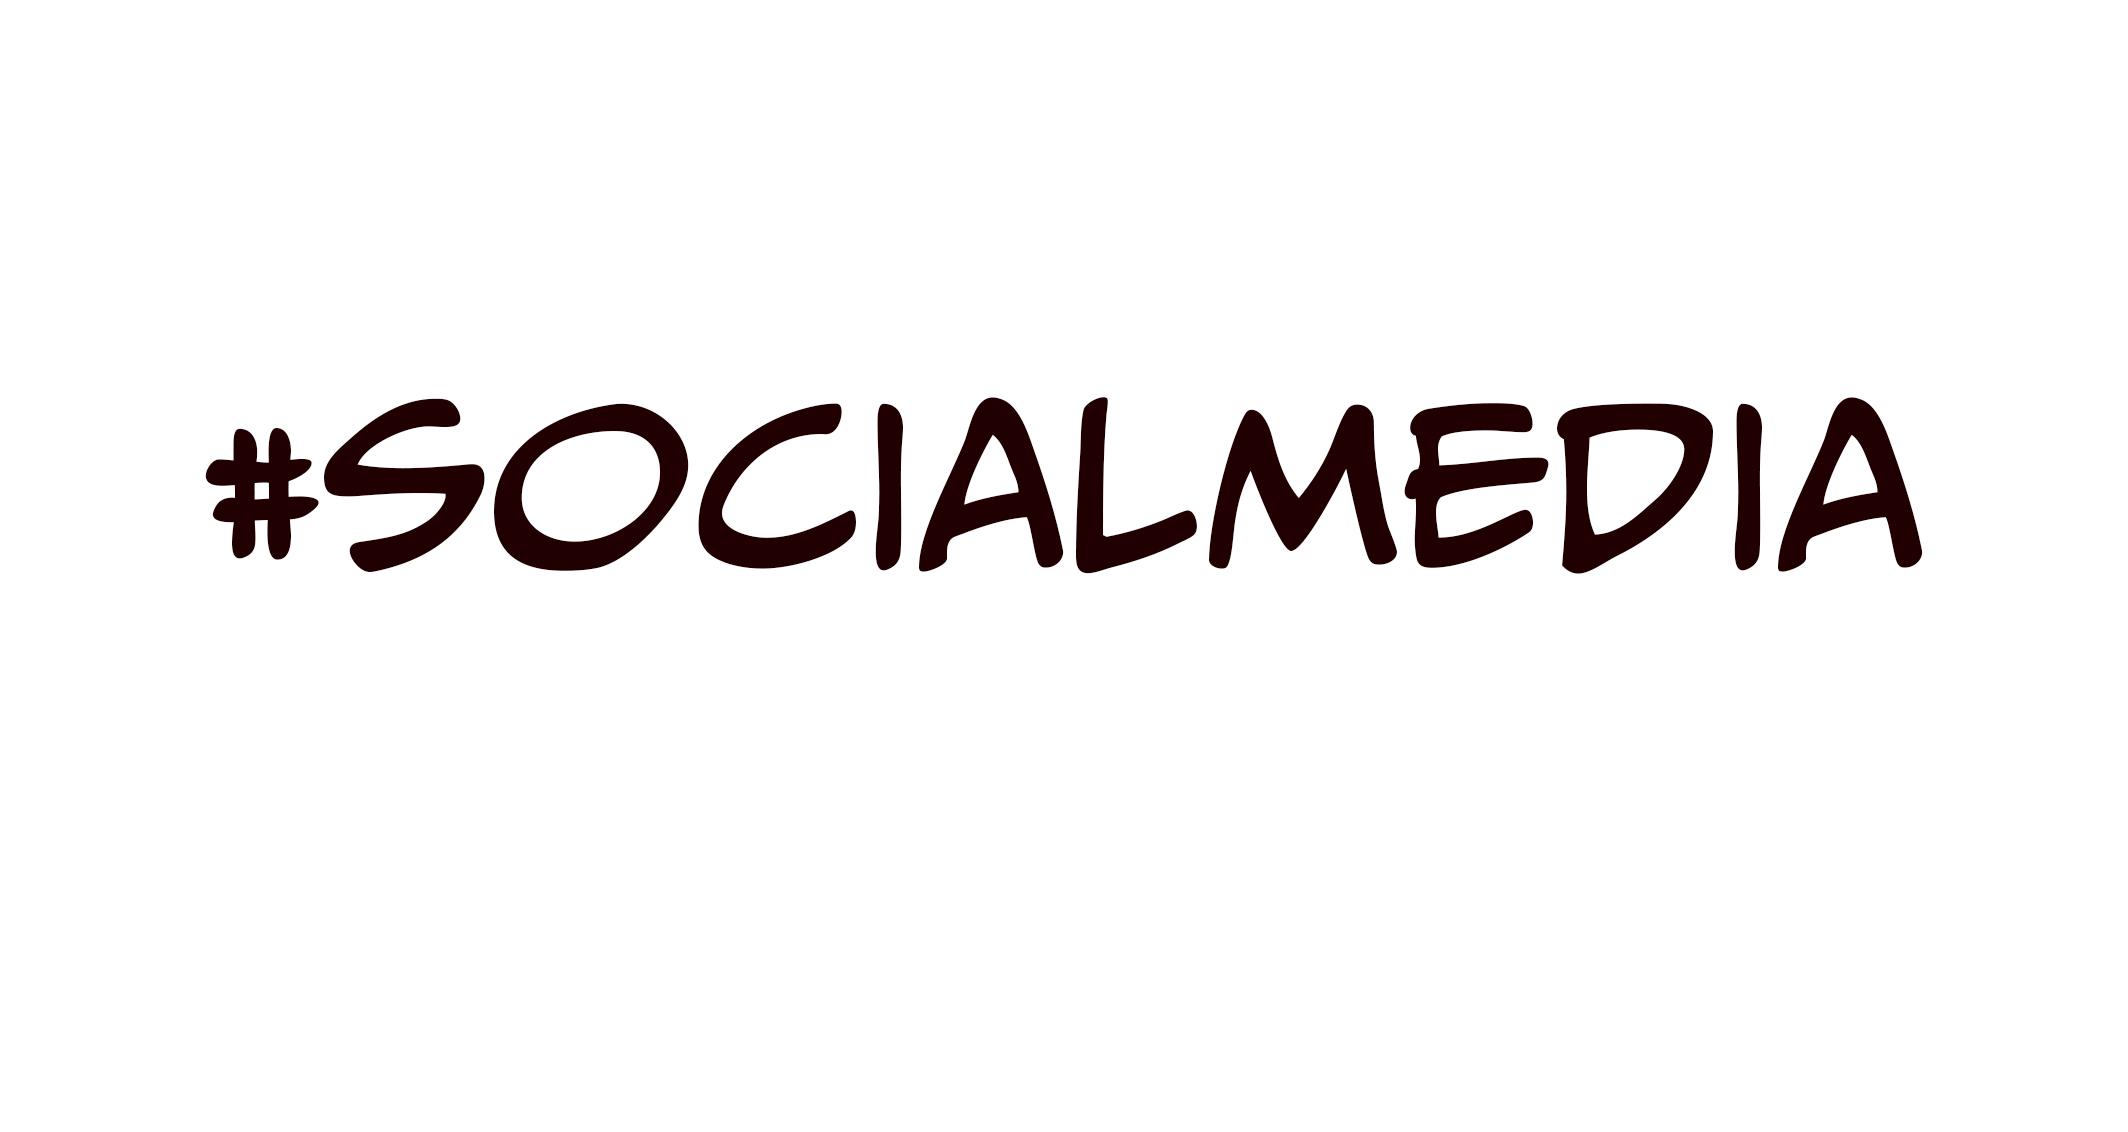 My New Social Media Policy